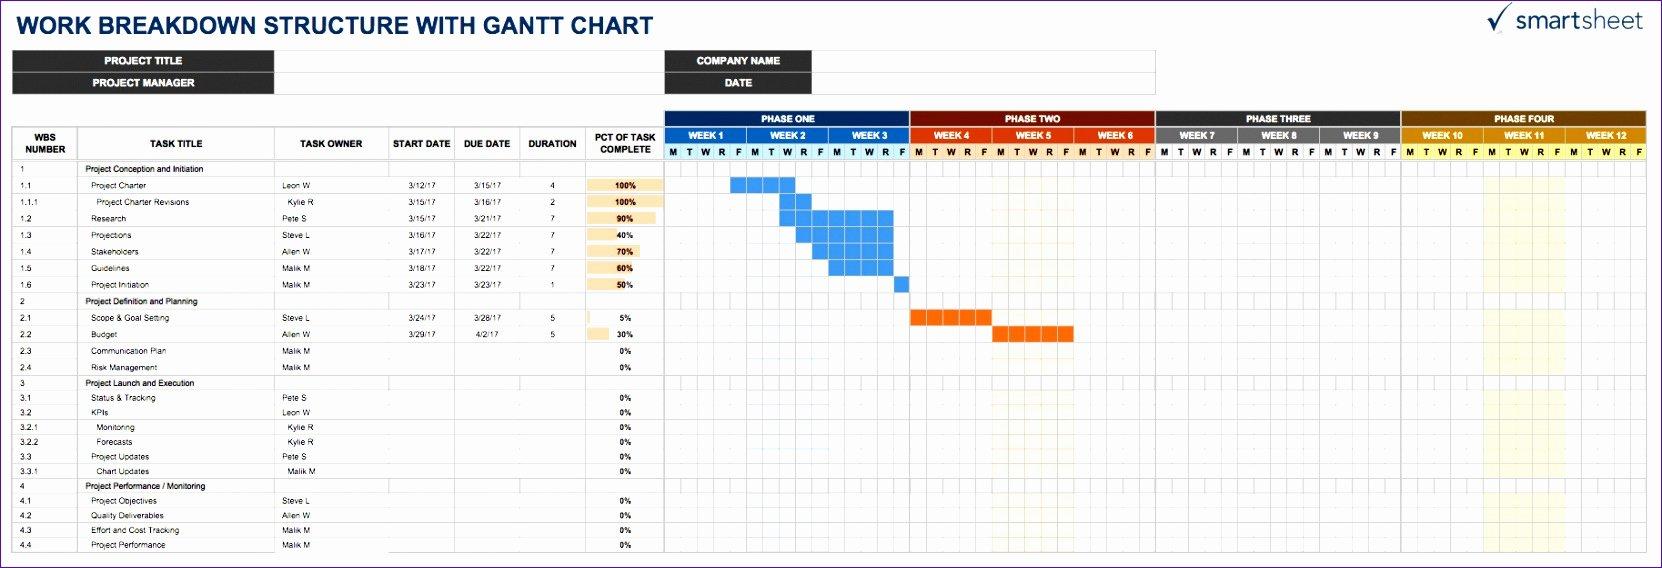 Work Breakdown Structure Template Excel Unique 10 Project Wbs Template Excel Exceltemplates